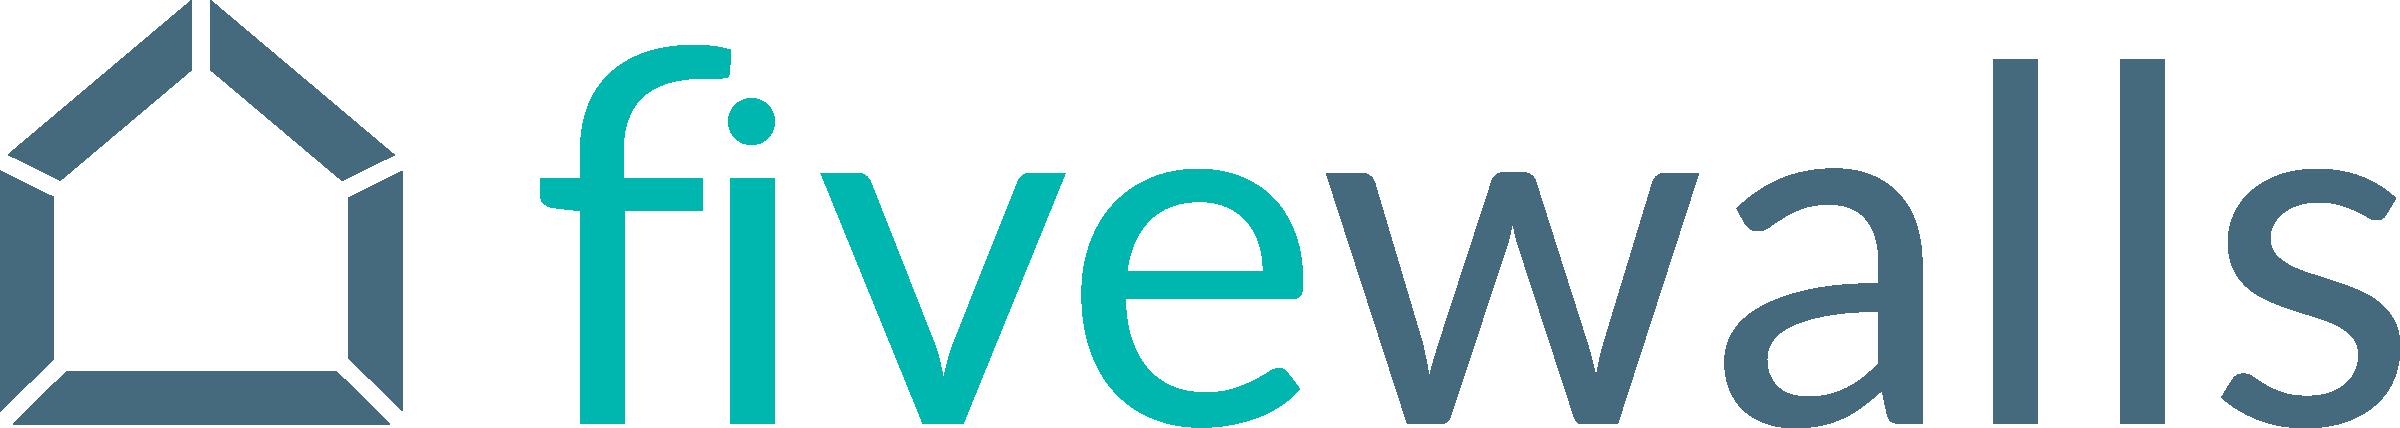 Fivewalls Realty logo